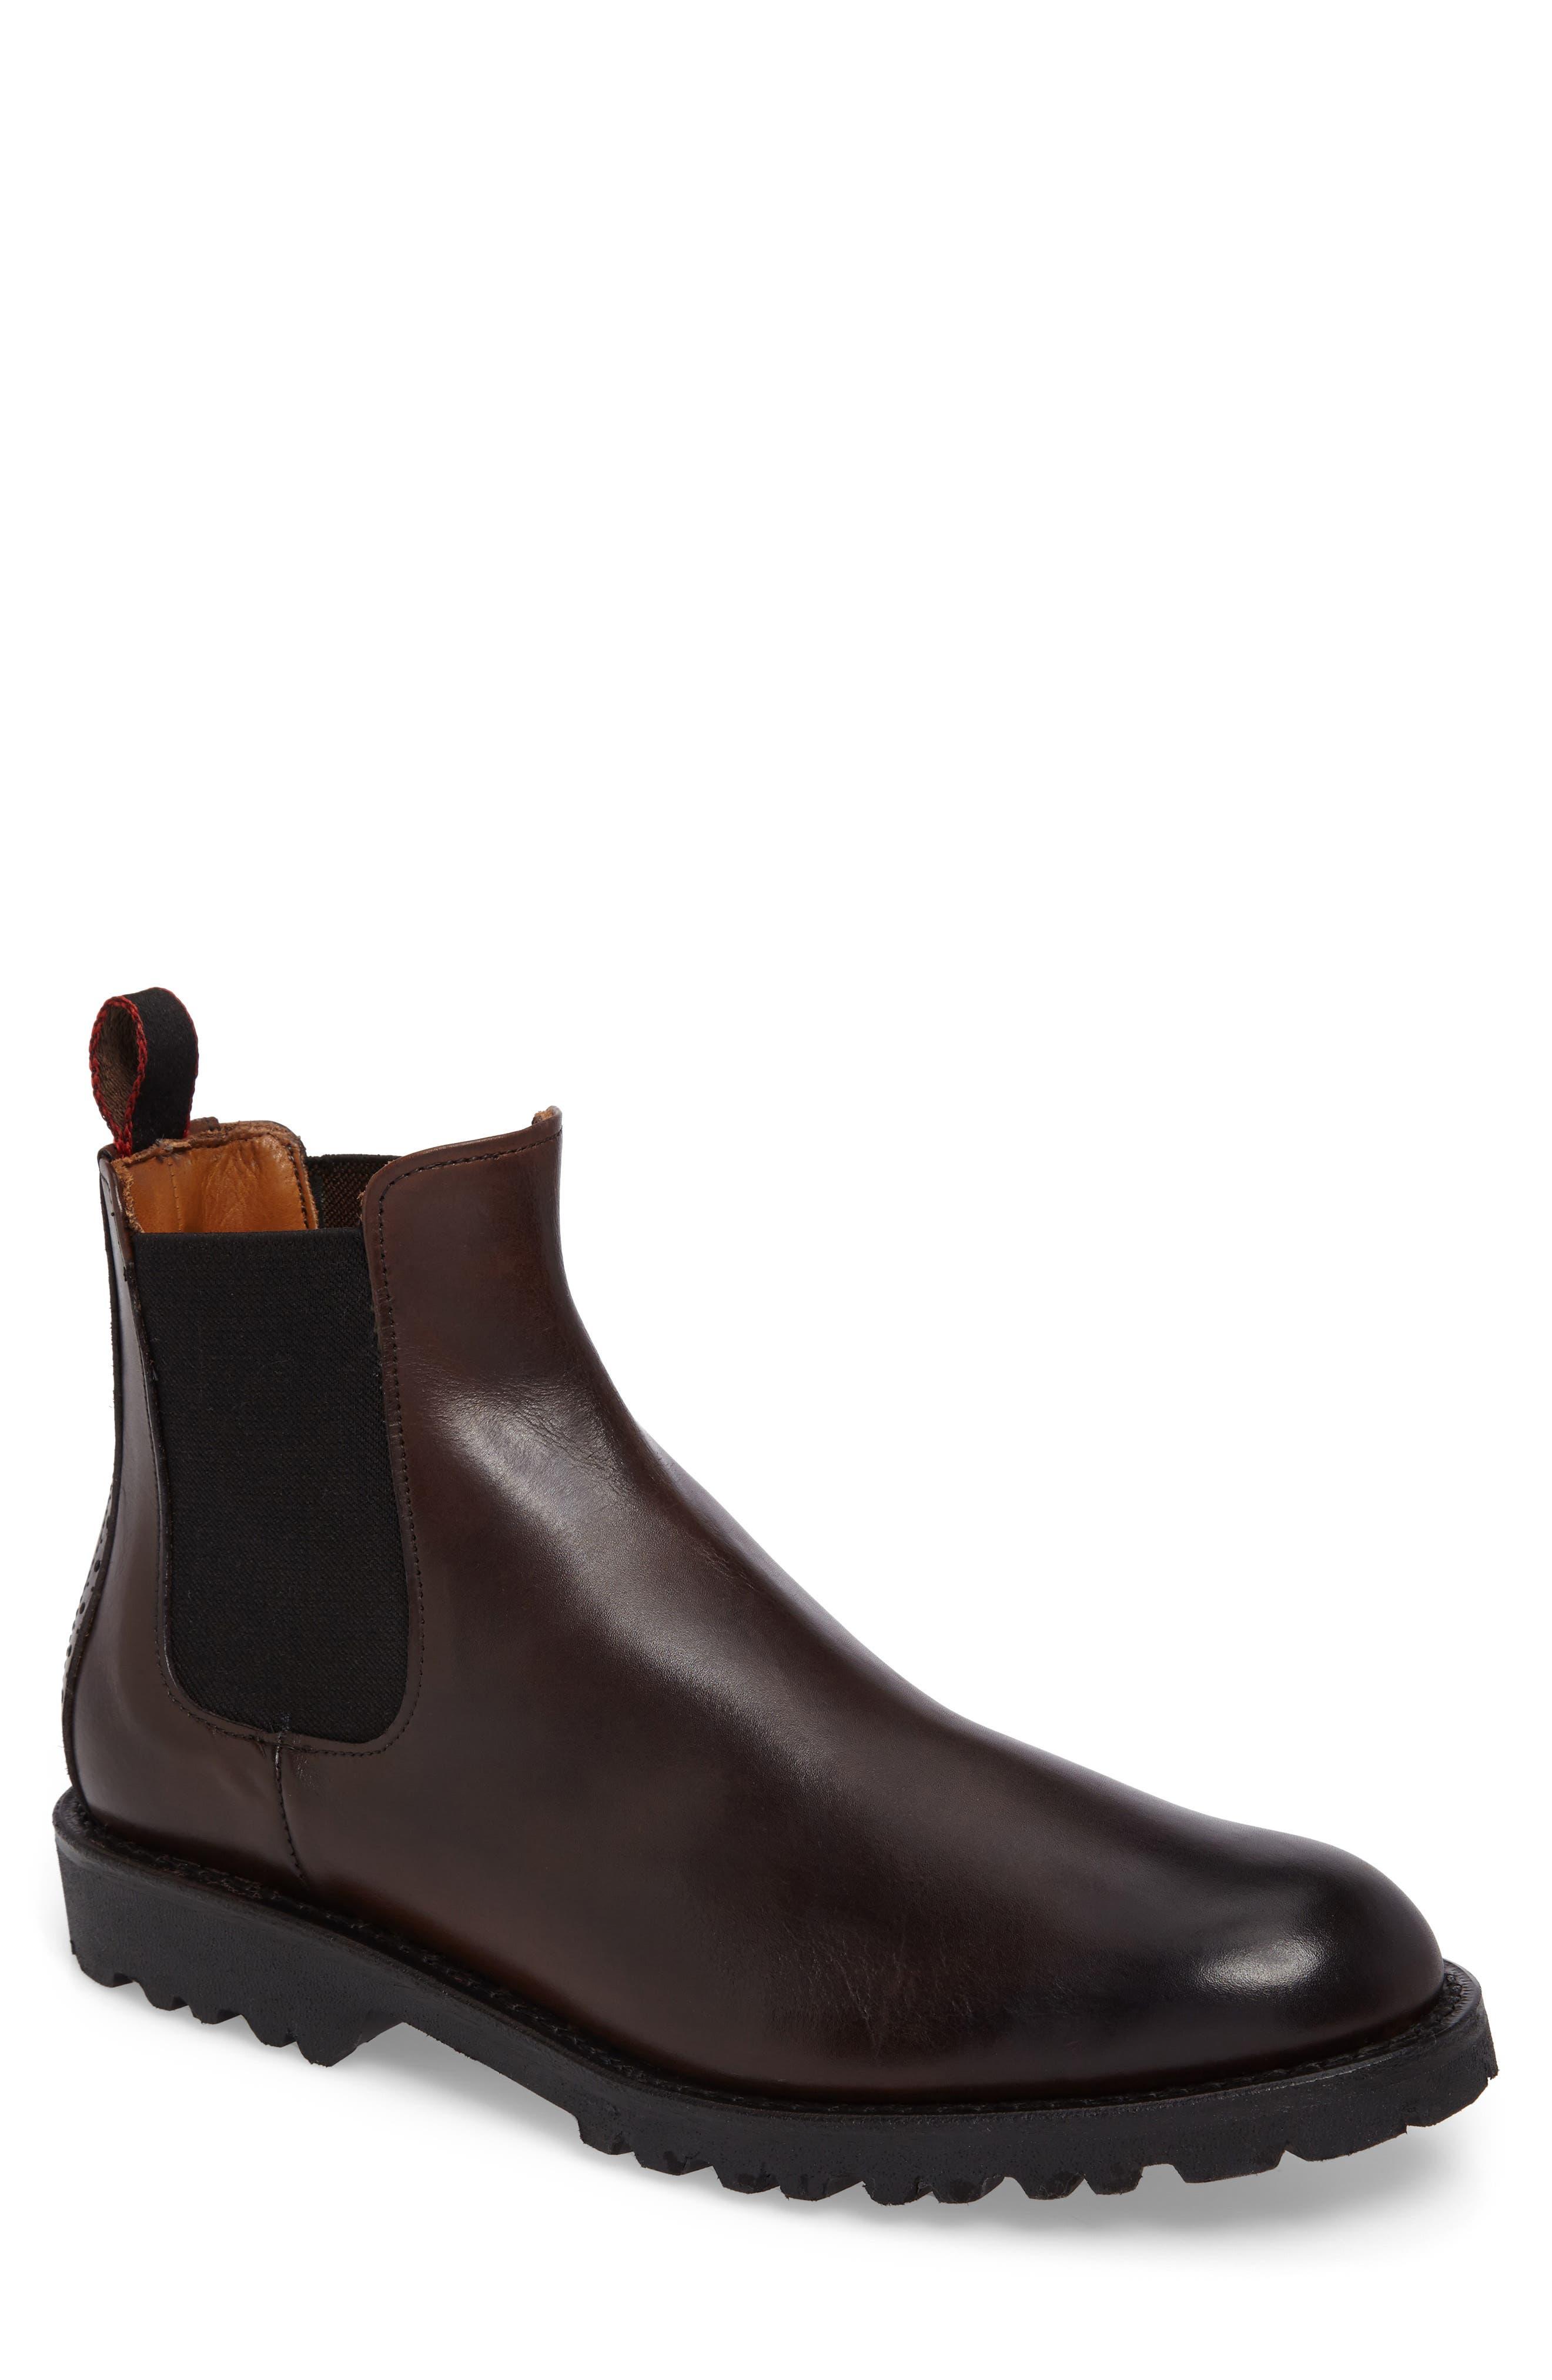 Mens Boots   Nordstrom